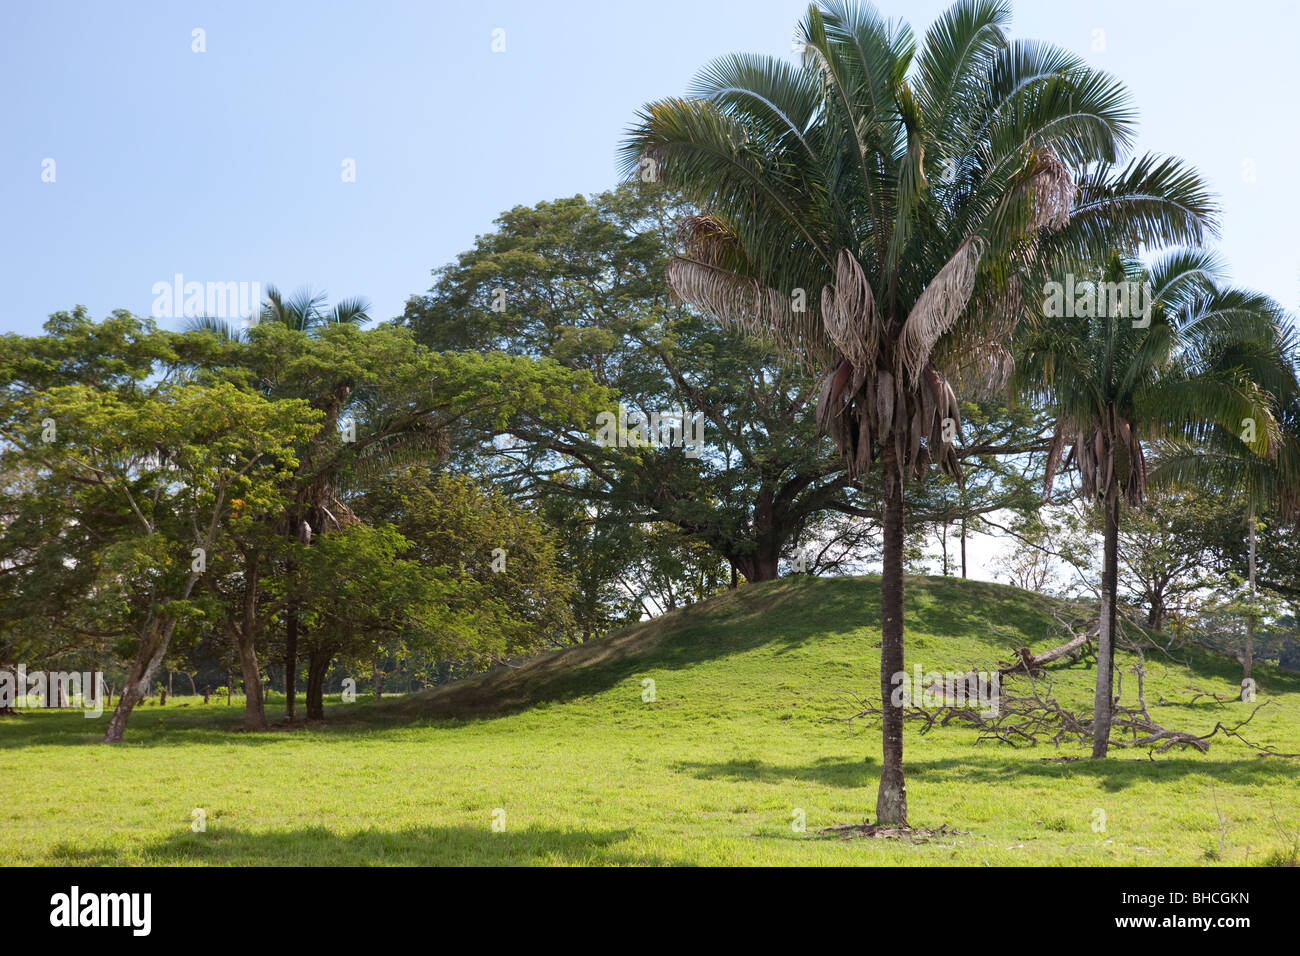 Inland scenery, Costa Rica - Stock Image